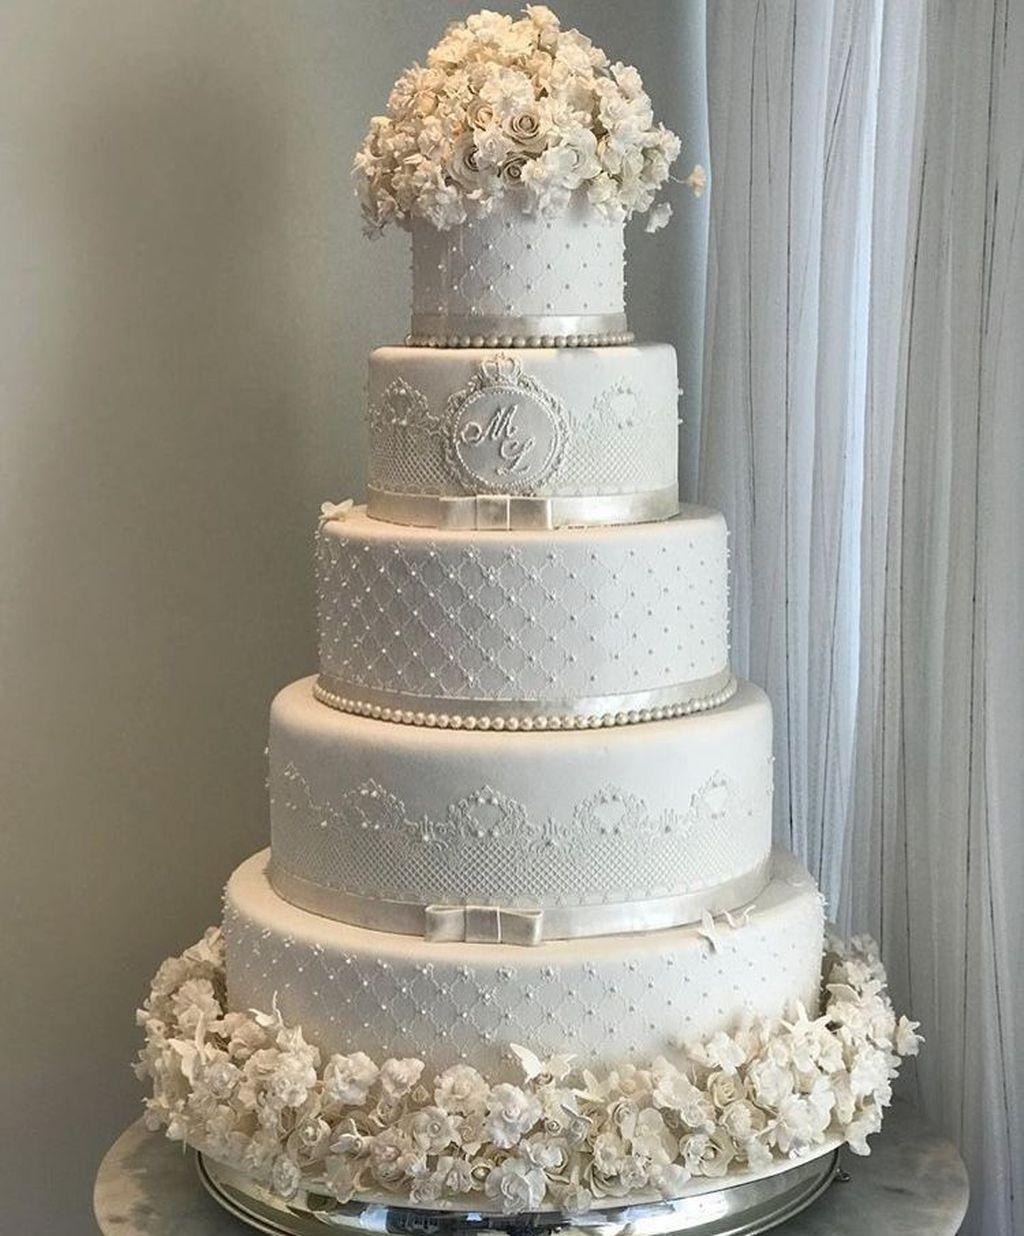 Wedding Cake Pics Ideas: 41 Popular Wonderland Wedding Cake Ideas For Winter